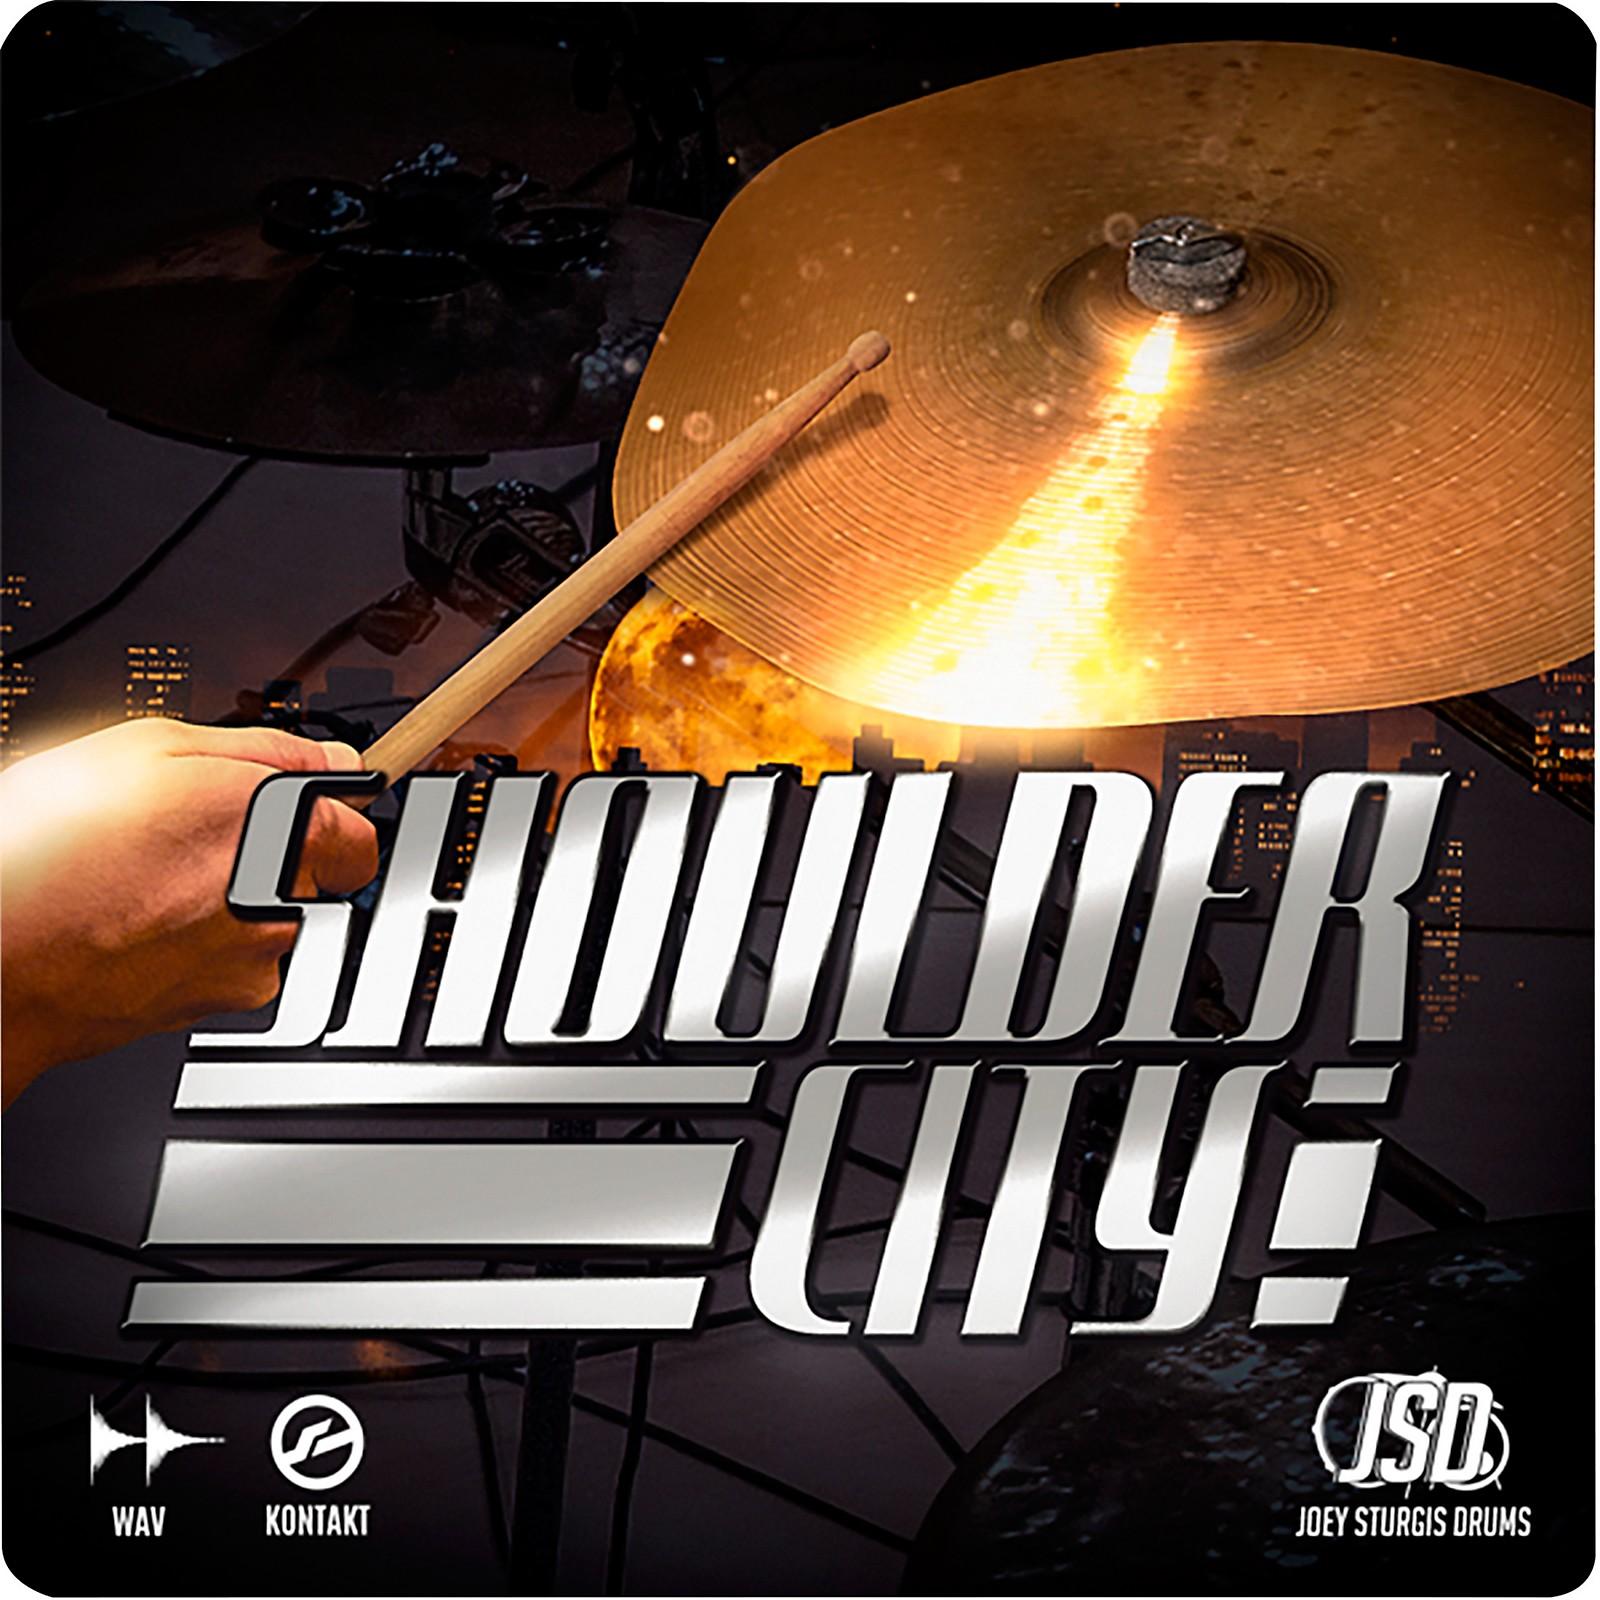 Joey Sturgis Drums Shoulder City Toms